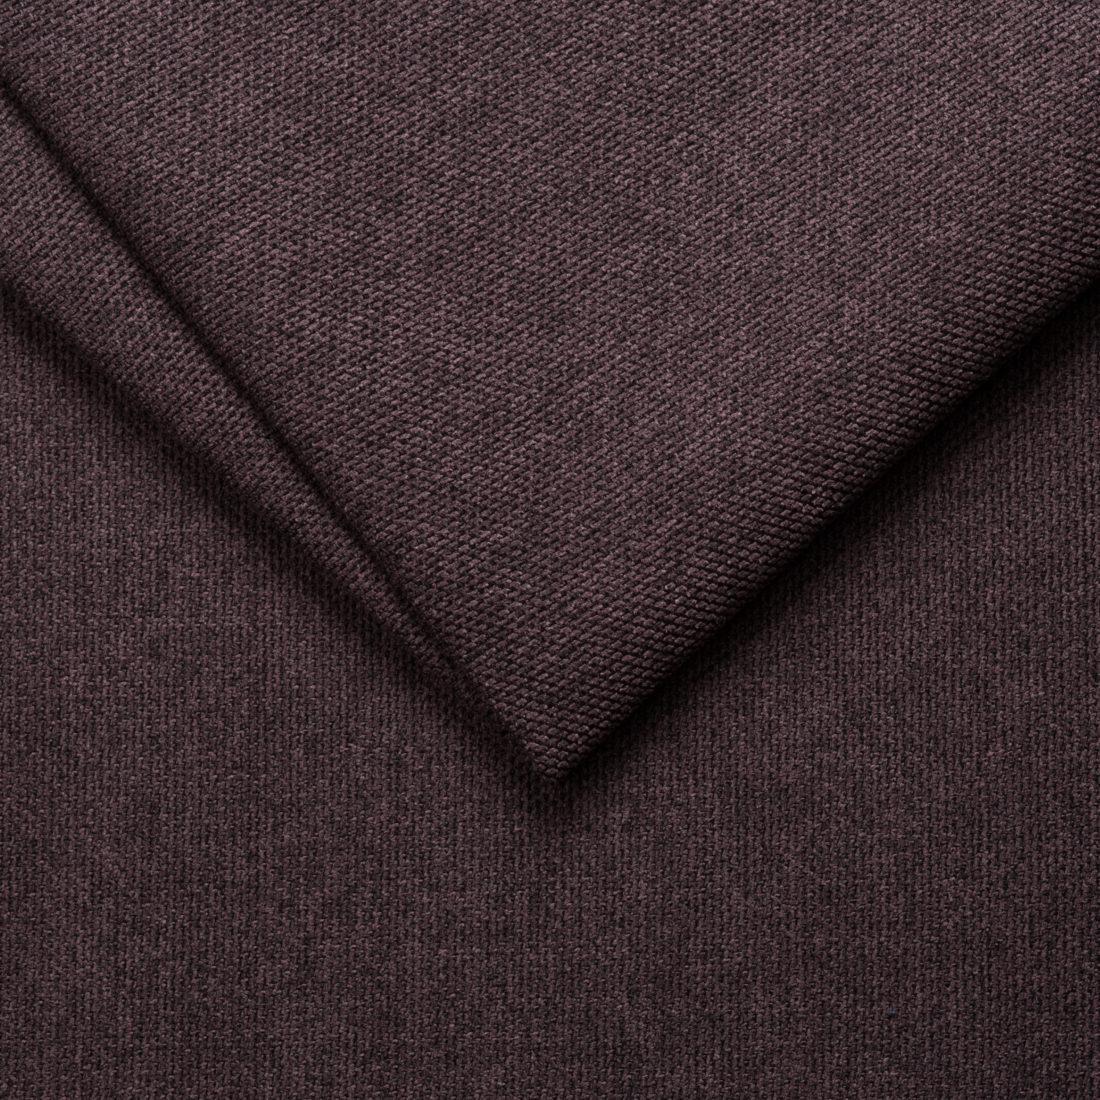 Меблева тканина Austin 7 Aubergine, рогожка